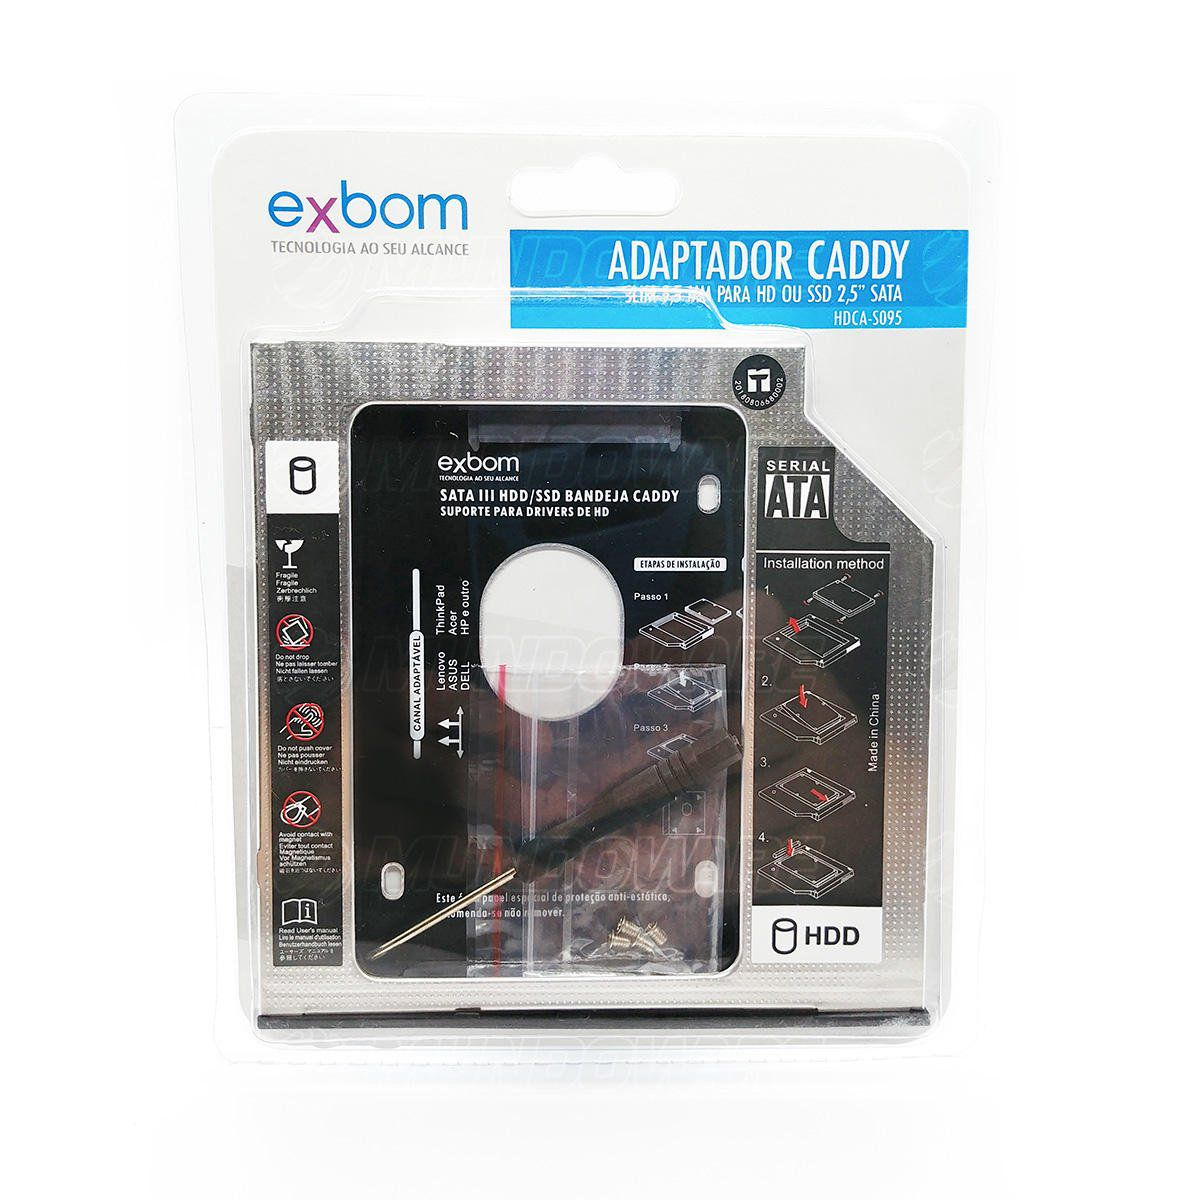 "Adaptador Caddy de 9.5mm Bandeja Interna Substitui Drive de DVD por Segundo HD / SSD 2.5"" SATA Exbom HDCA-S095"